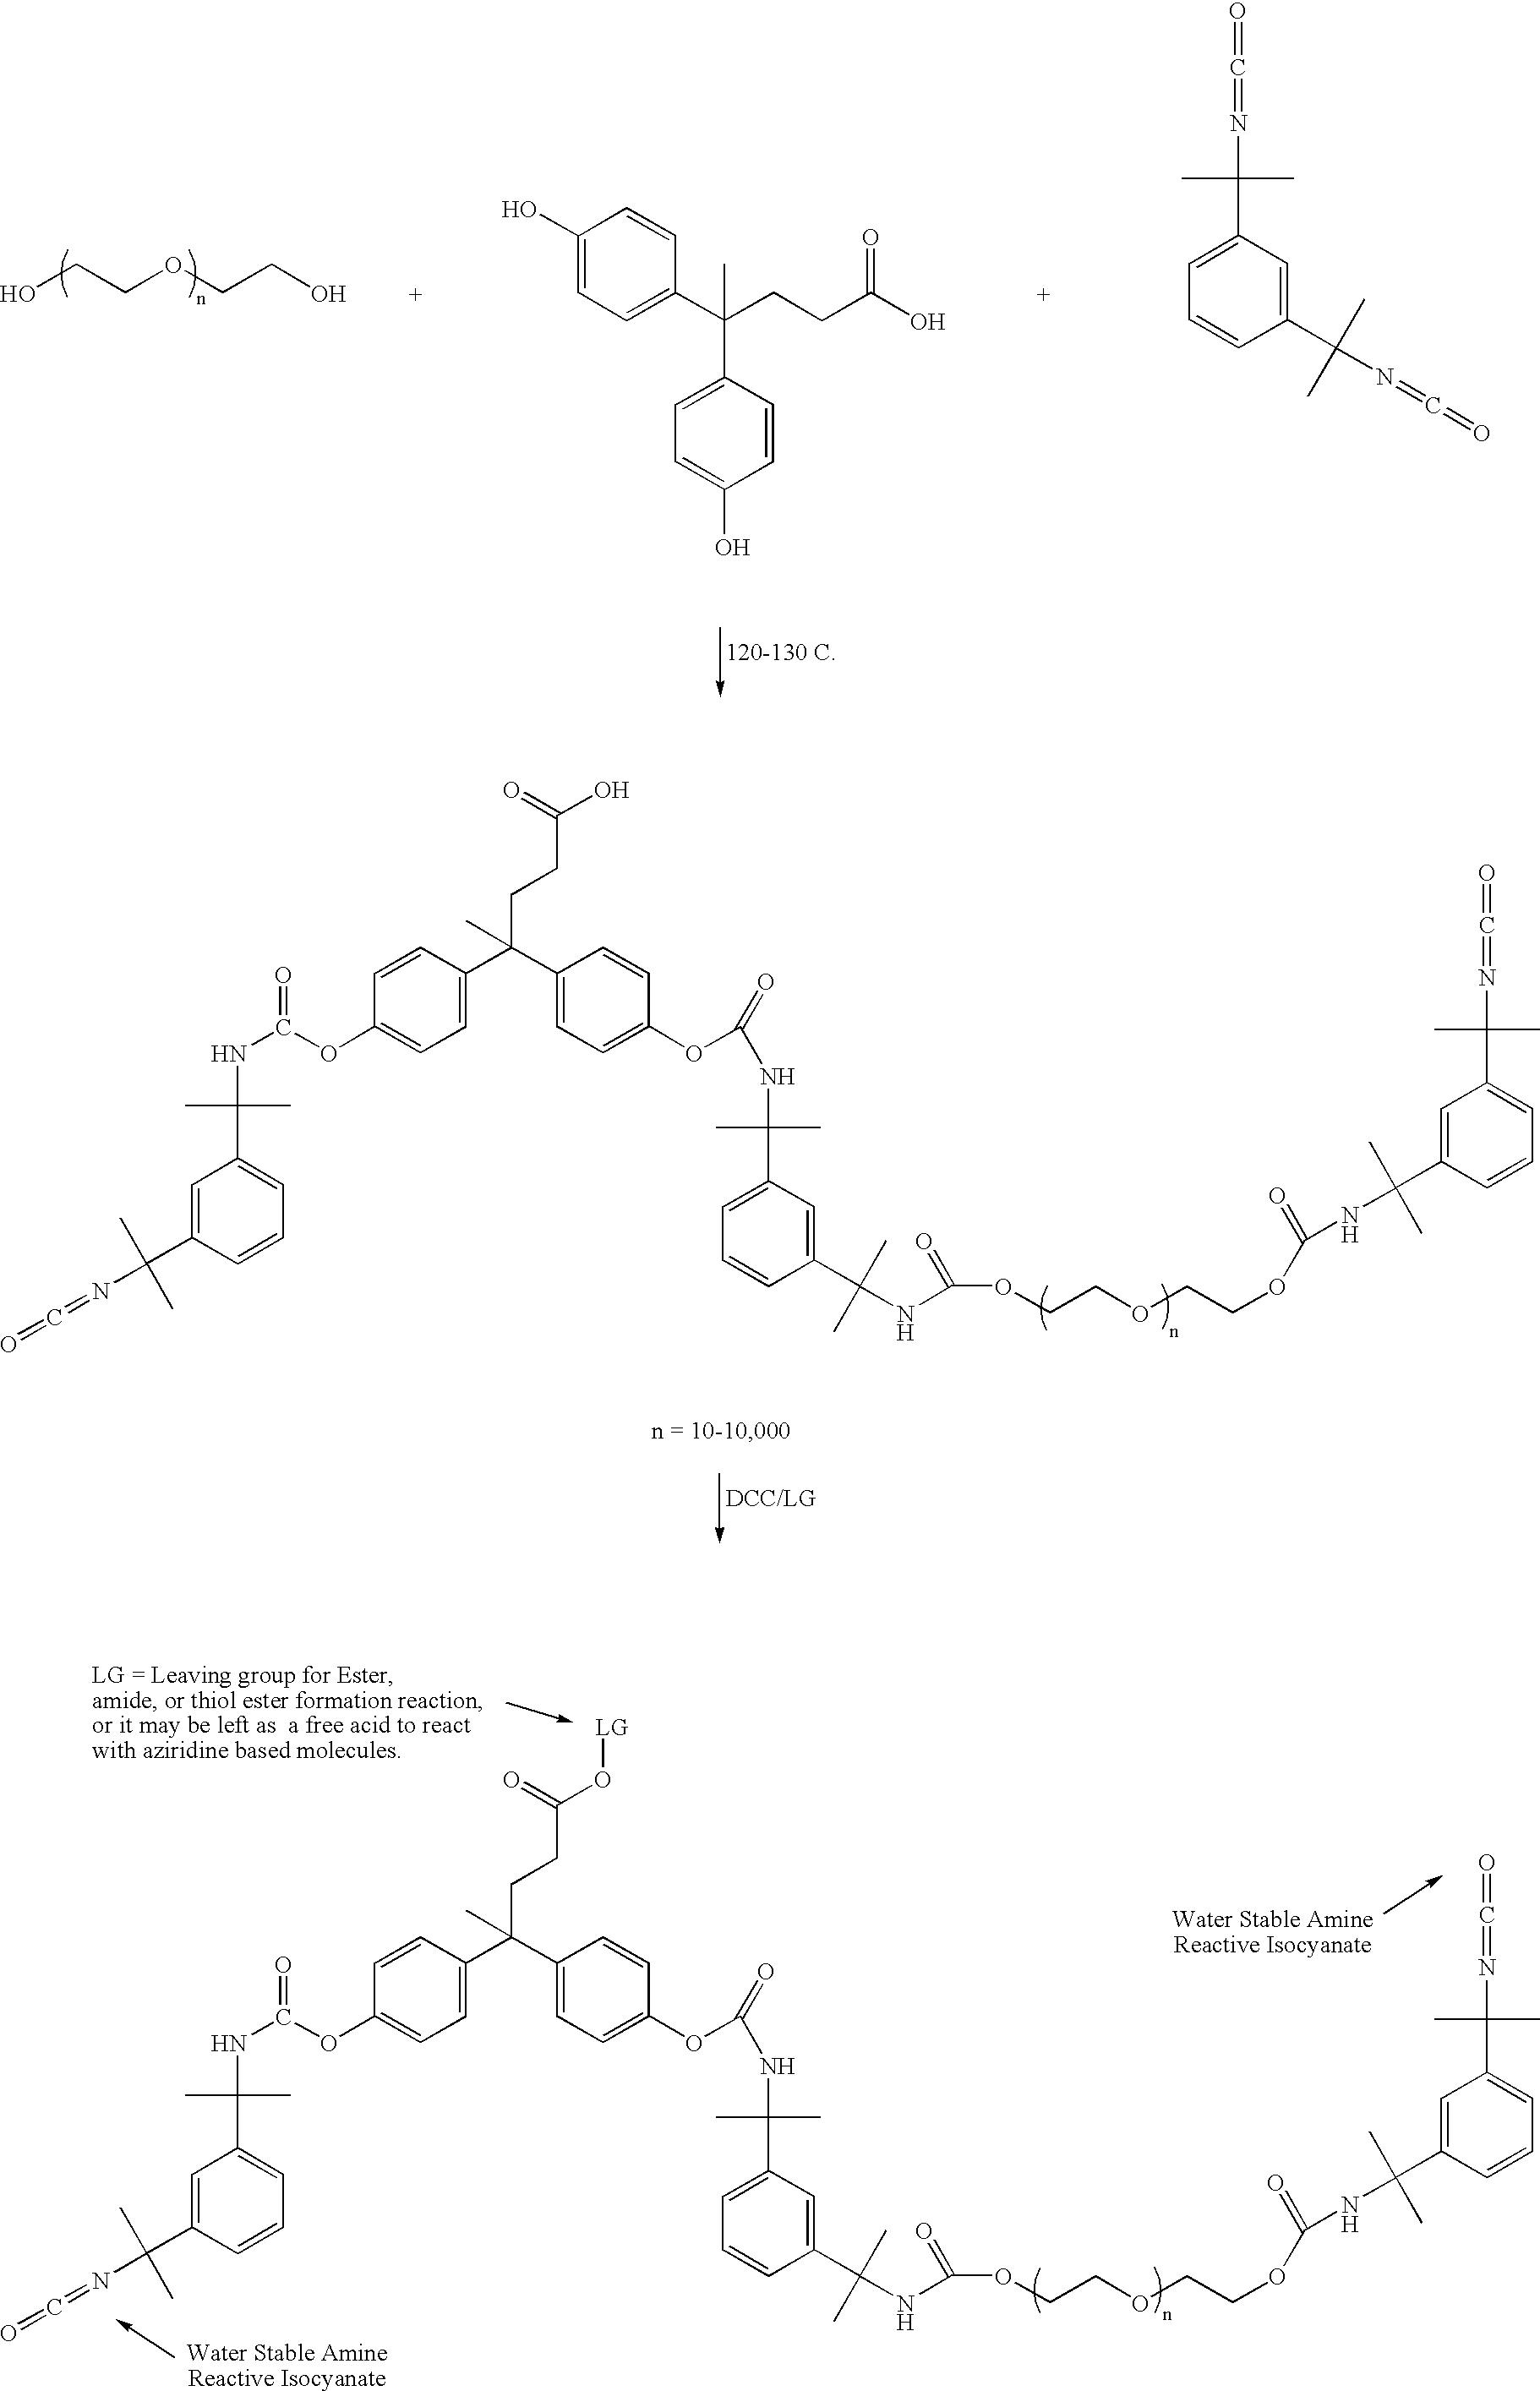 Us20070196454a1 Crosslinked Gels Comprising Polyalkyleneimines 1911 Barrel Schematic Diagram Get Free Image About Wiring Figure 20070823 C00008